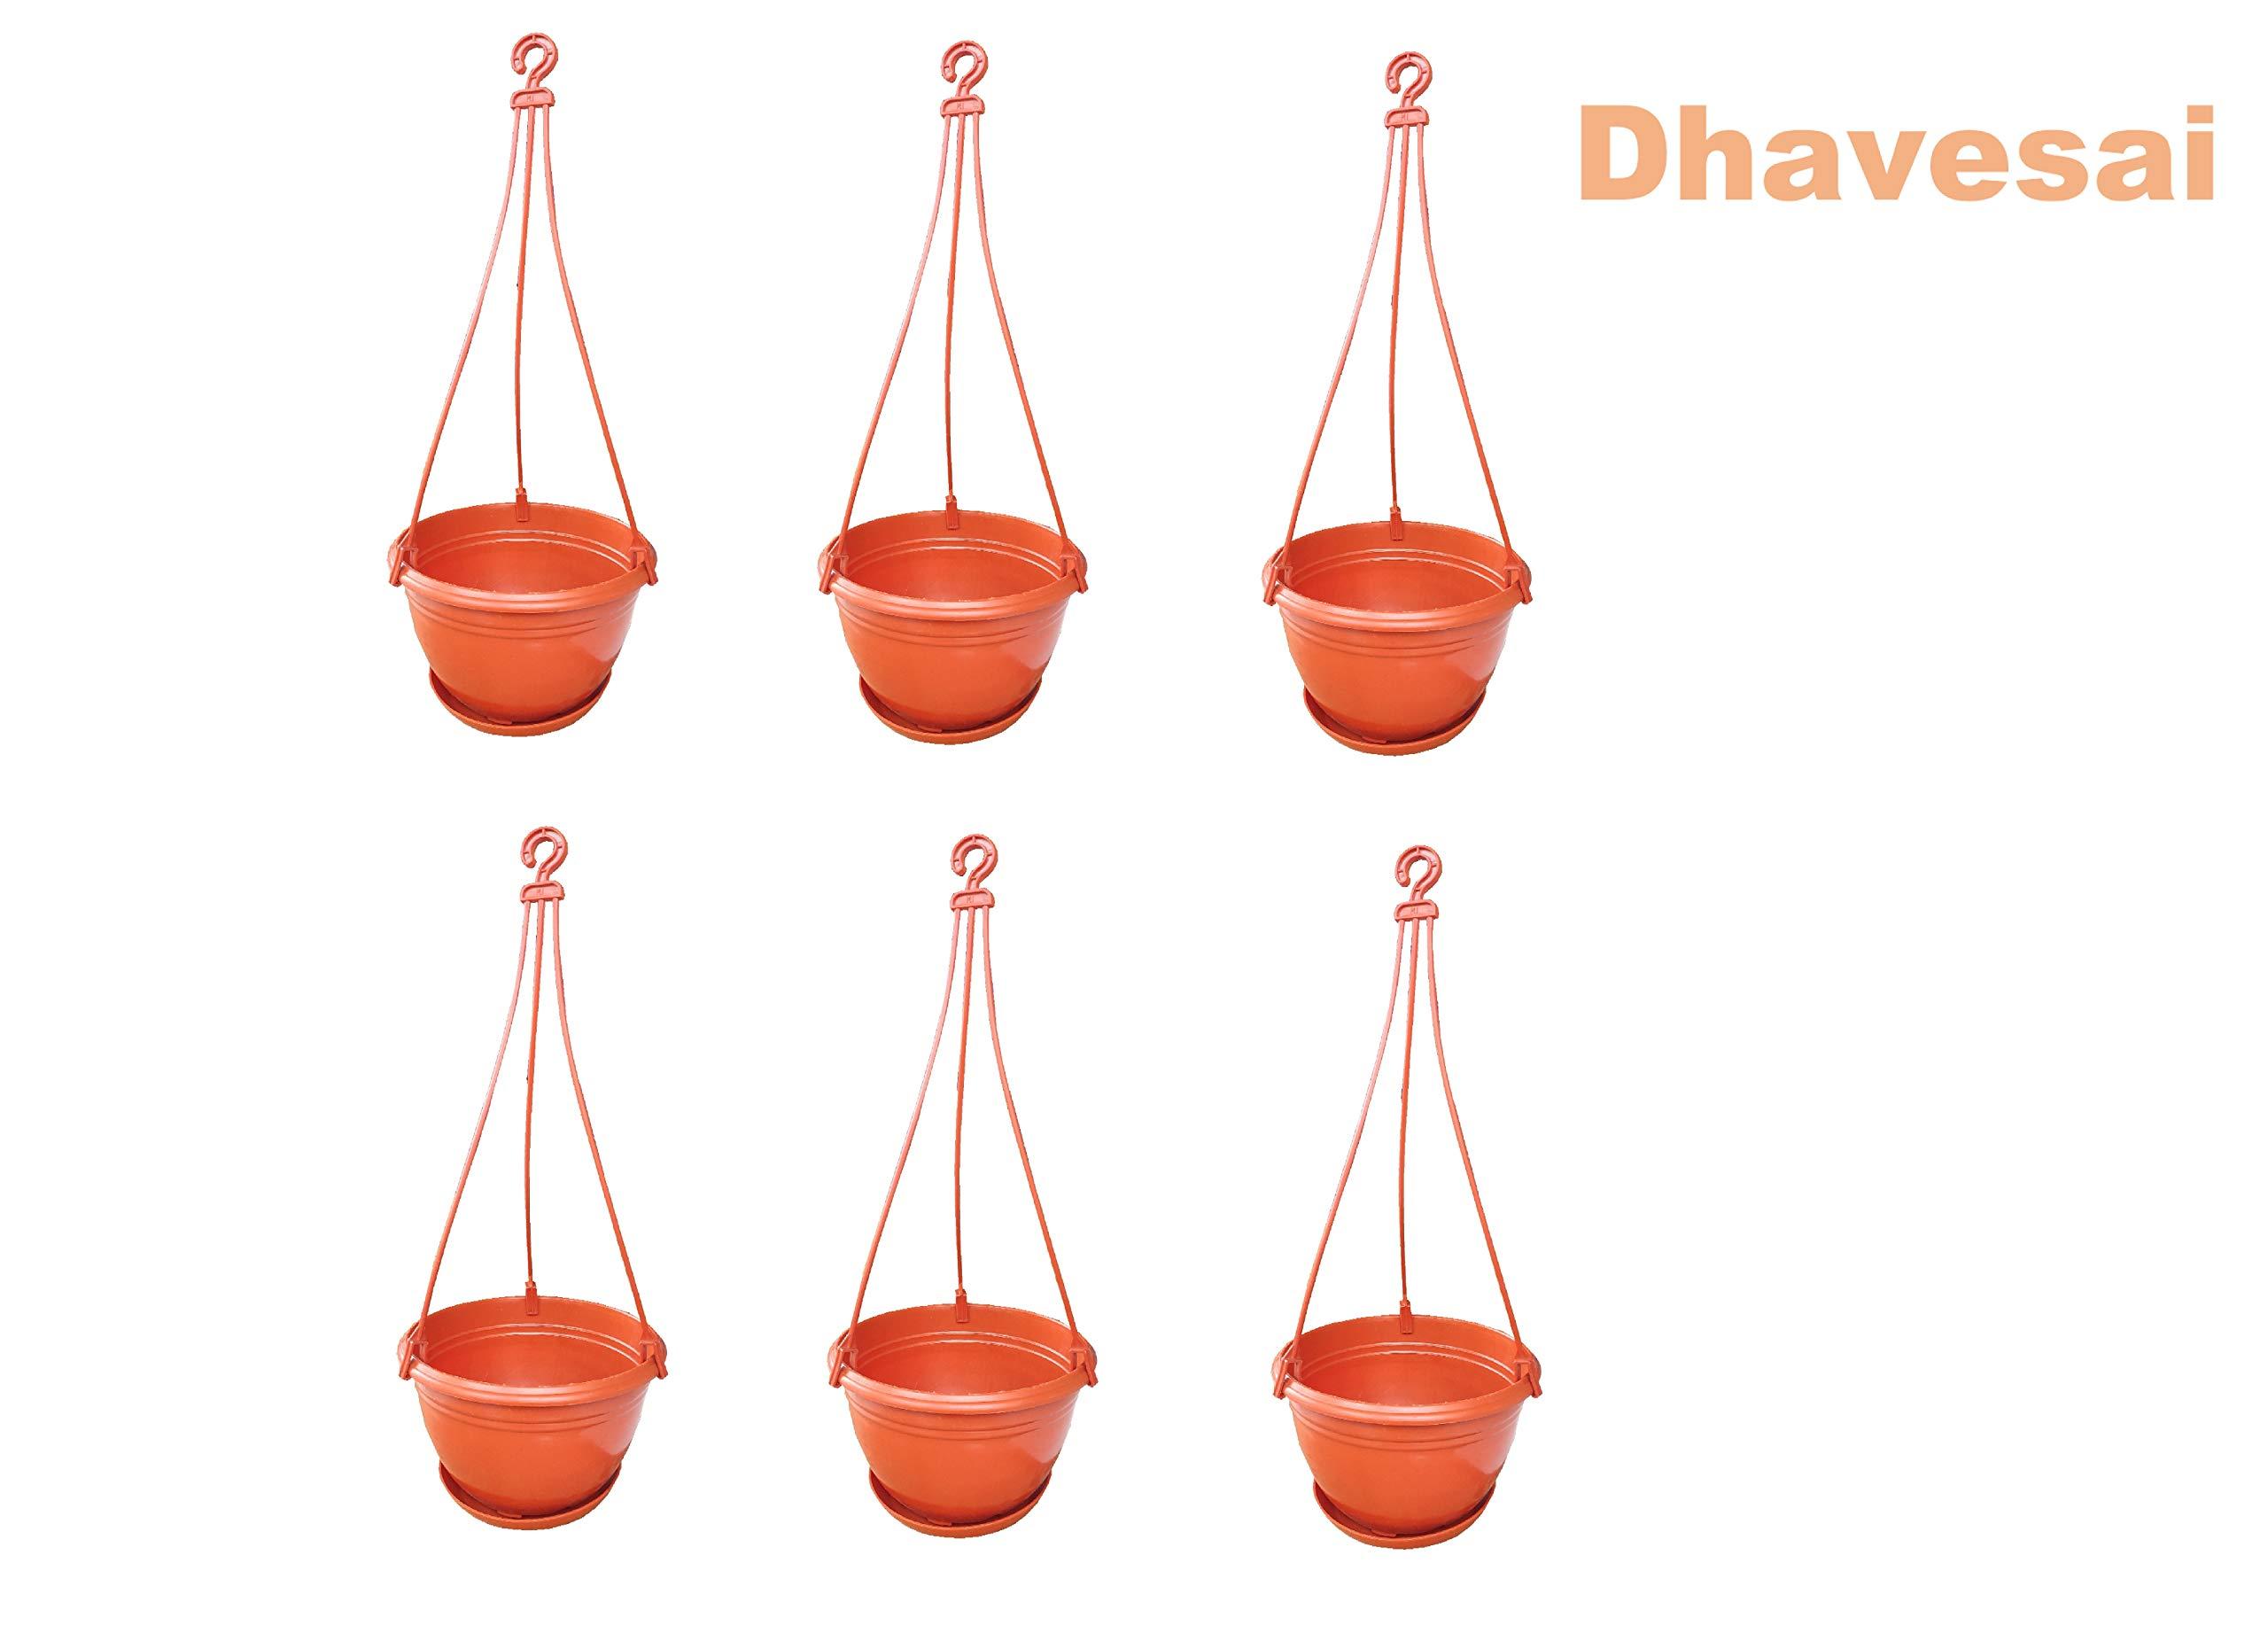 Dhavesai Hanging Pot/Planters, Brown ( Set of 6) product image